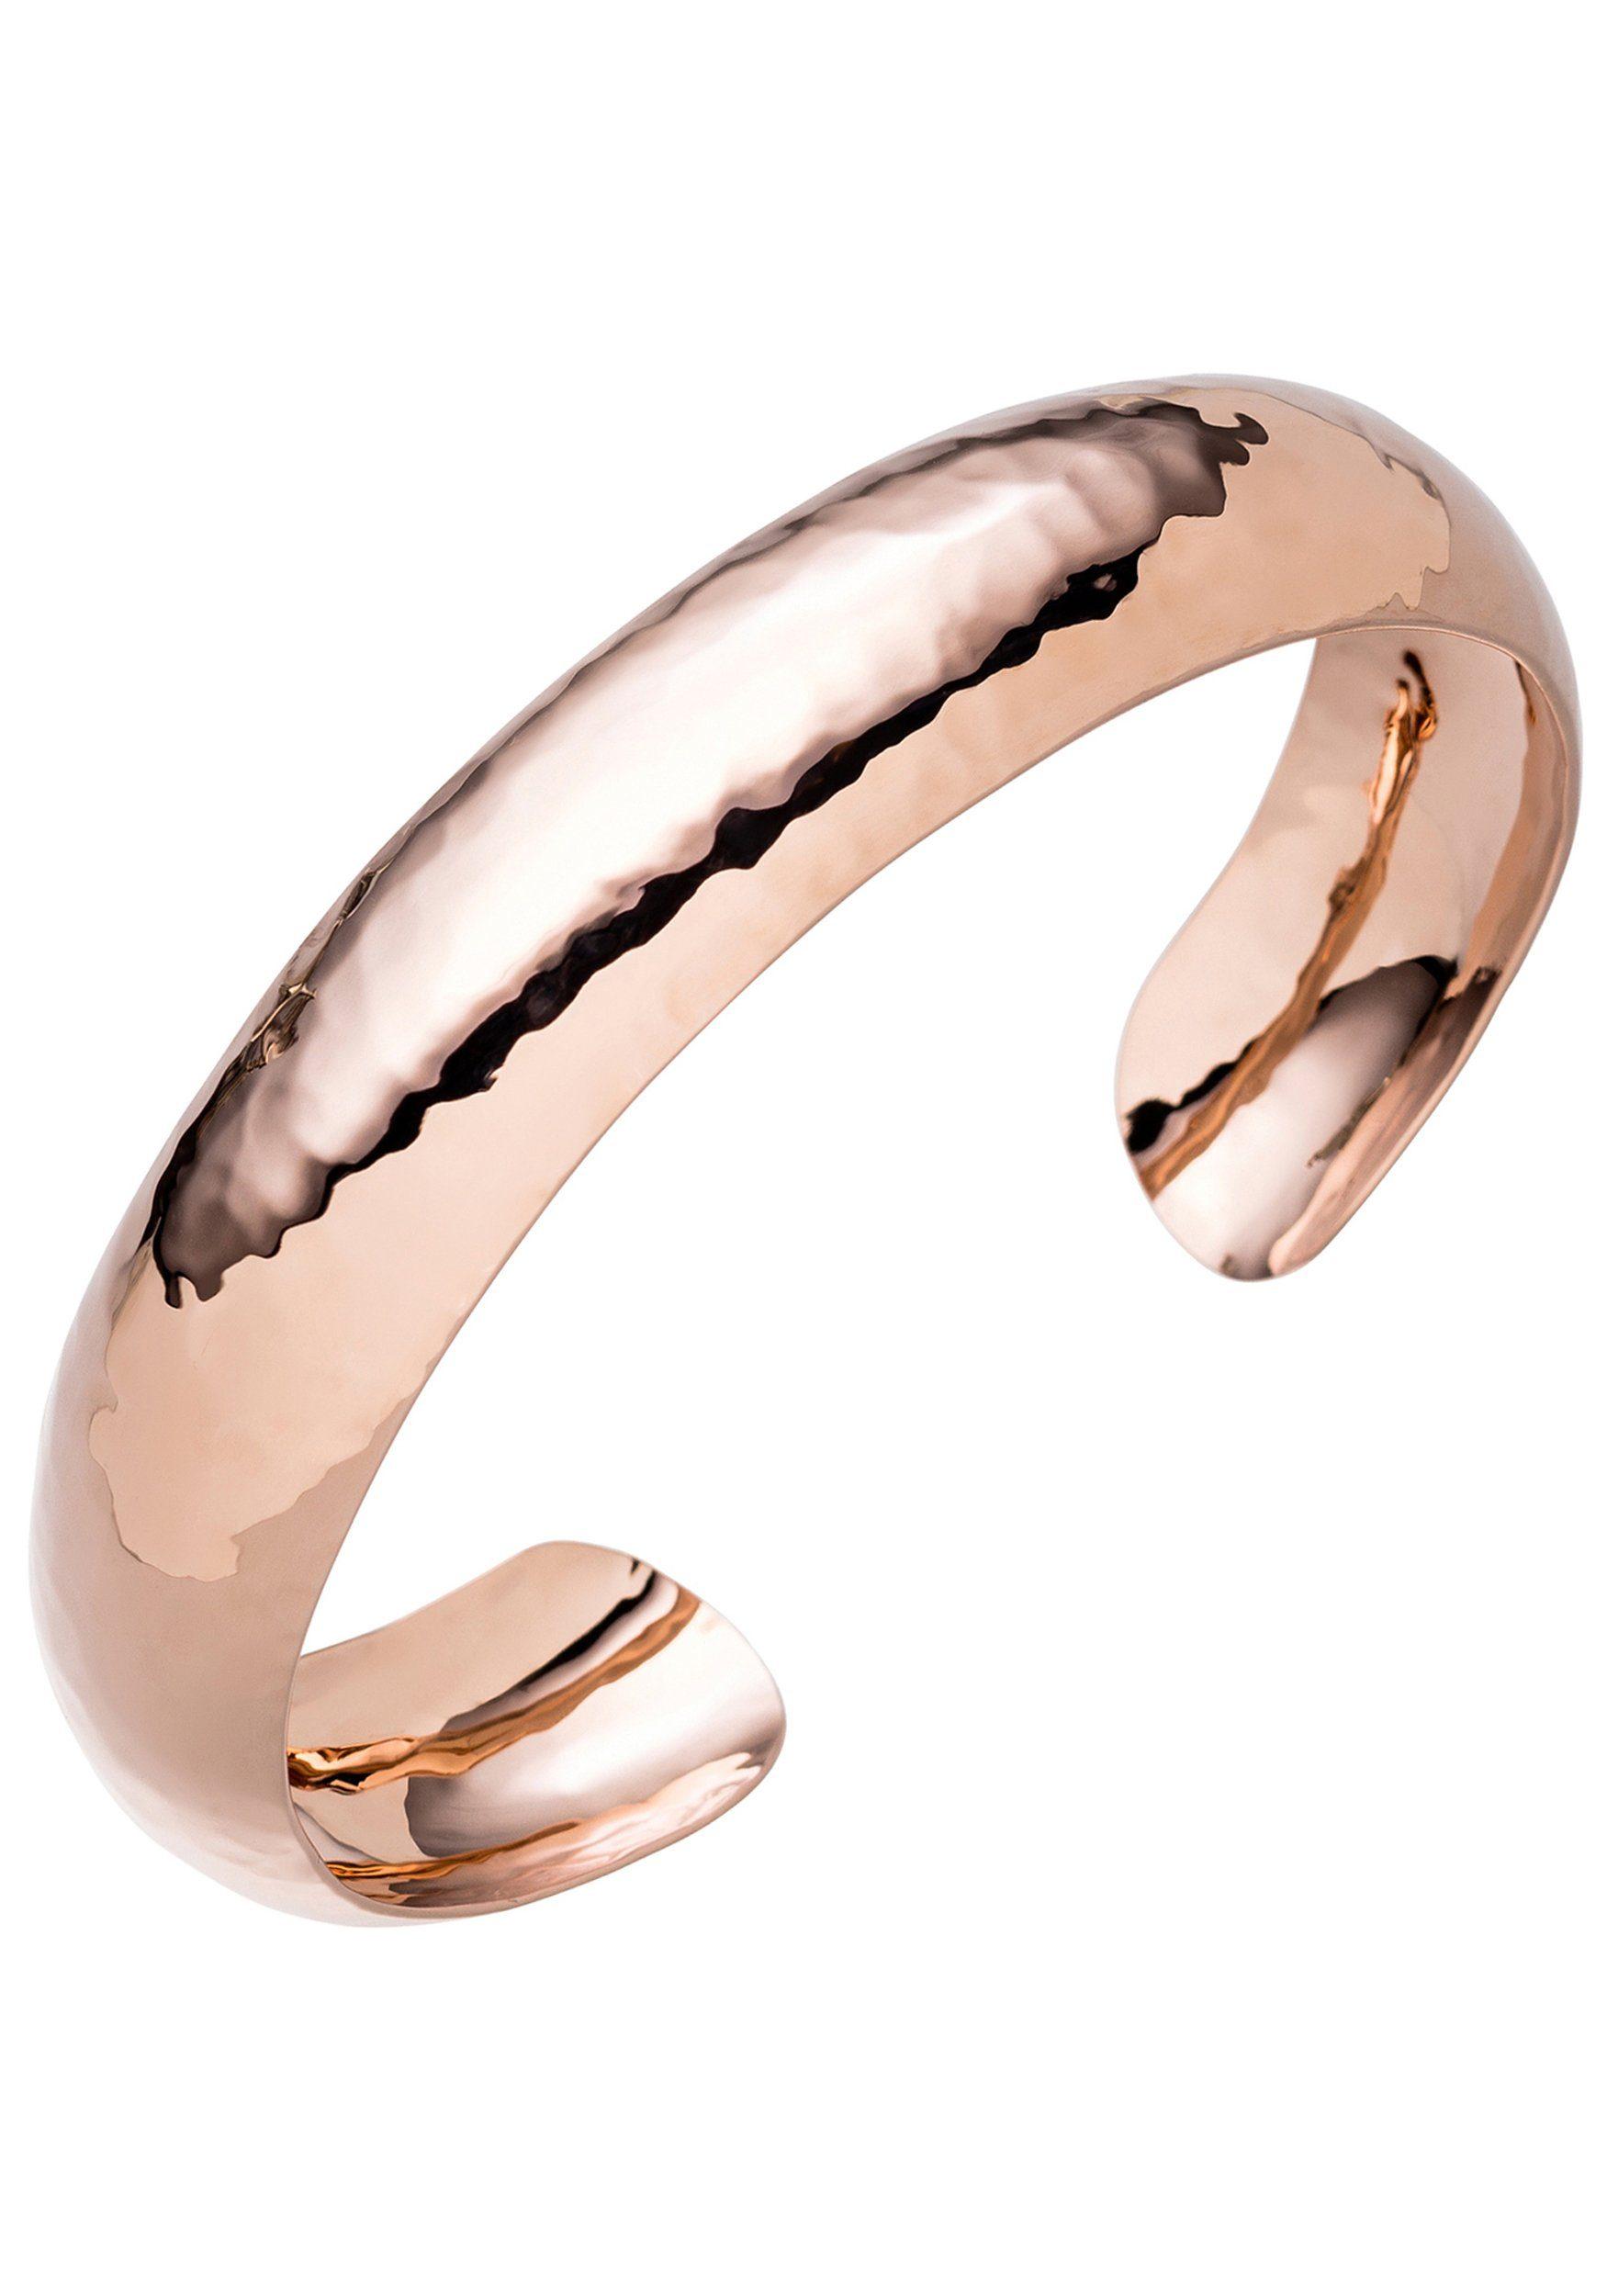 JOBO Armspange 925 Silber roségold vergoldet